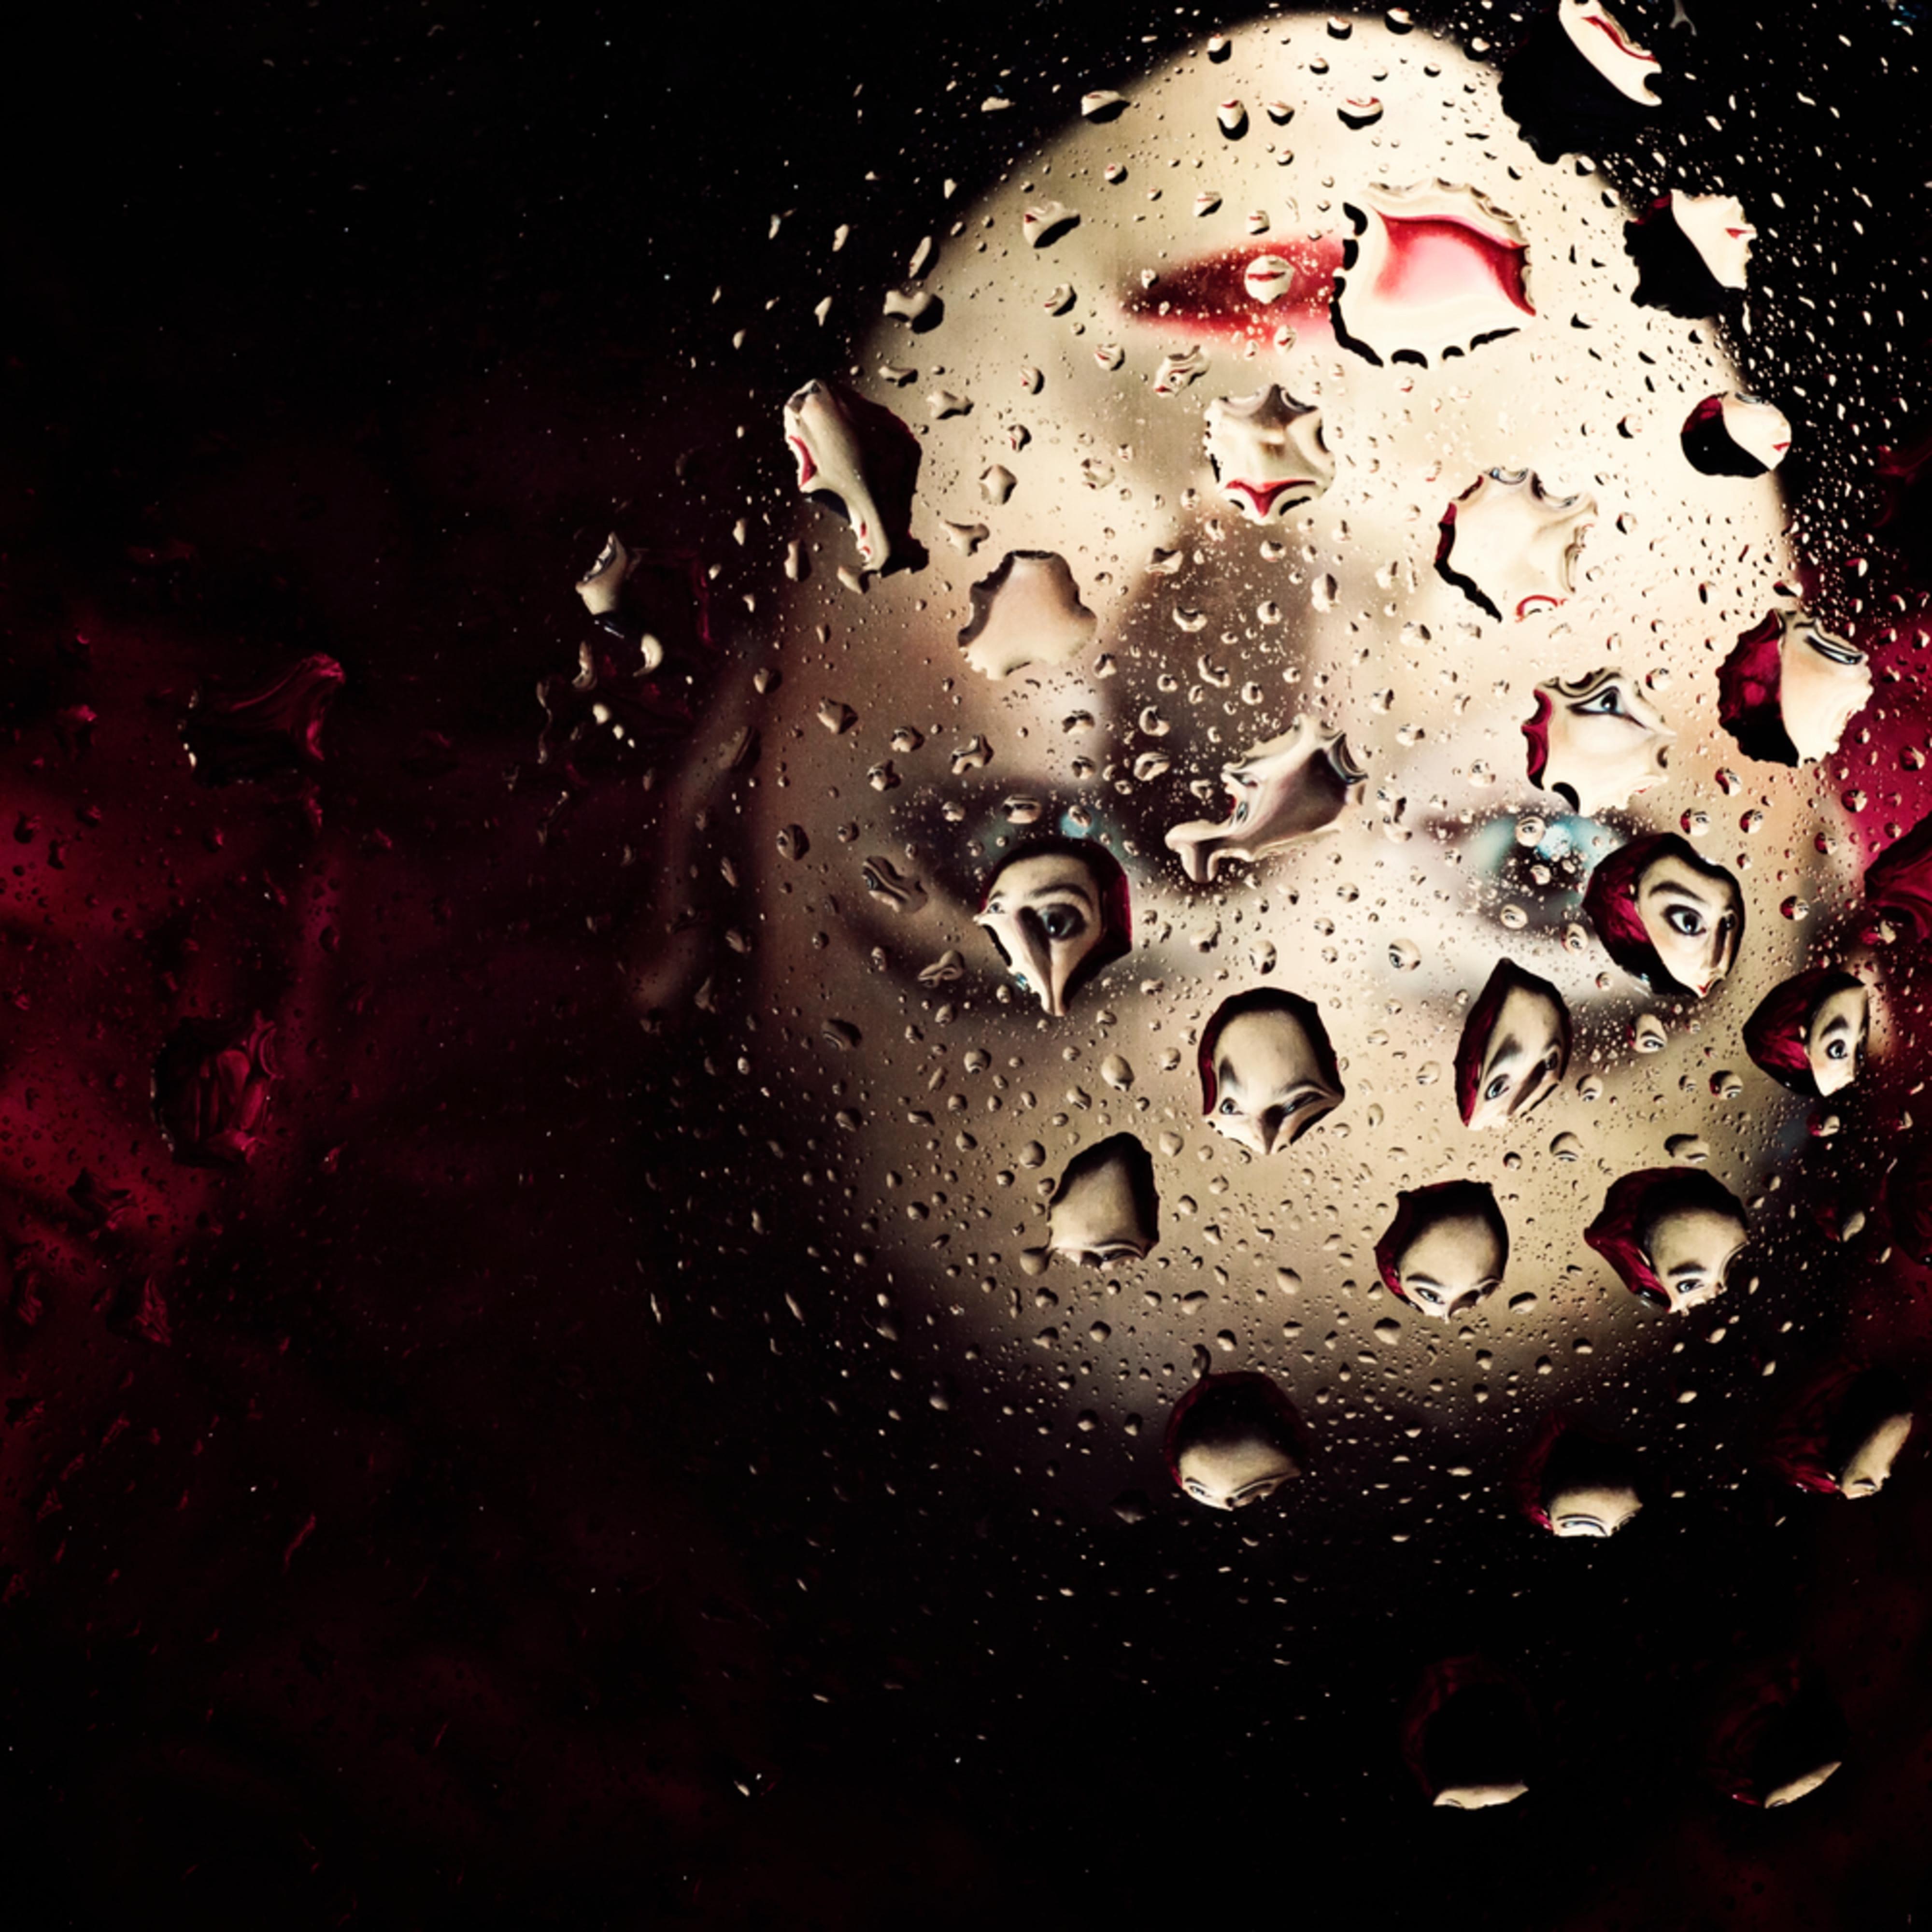 Masquerade abstract portrait photography fine art print silvia nikolov likuqw